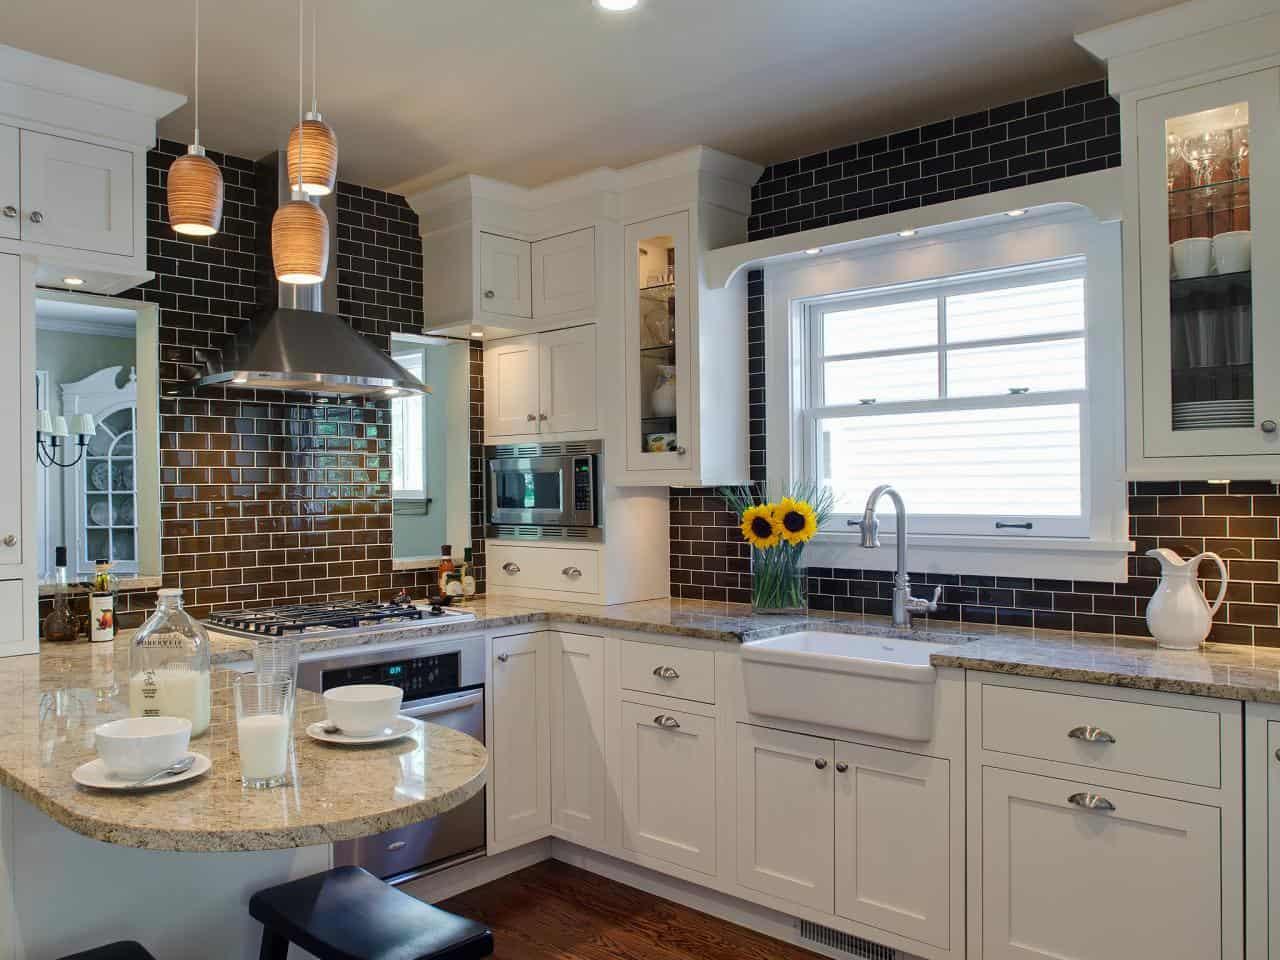 11 Kitchen Backsplash Ideas You Should Consider on Black Countertop Backsplash Ideas  id=34710